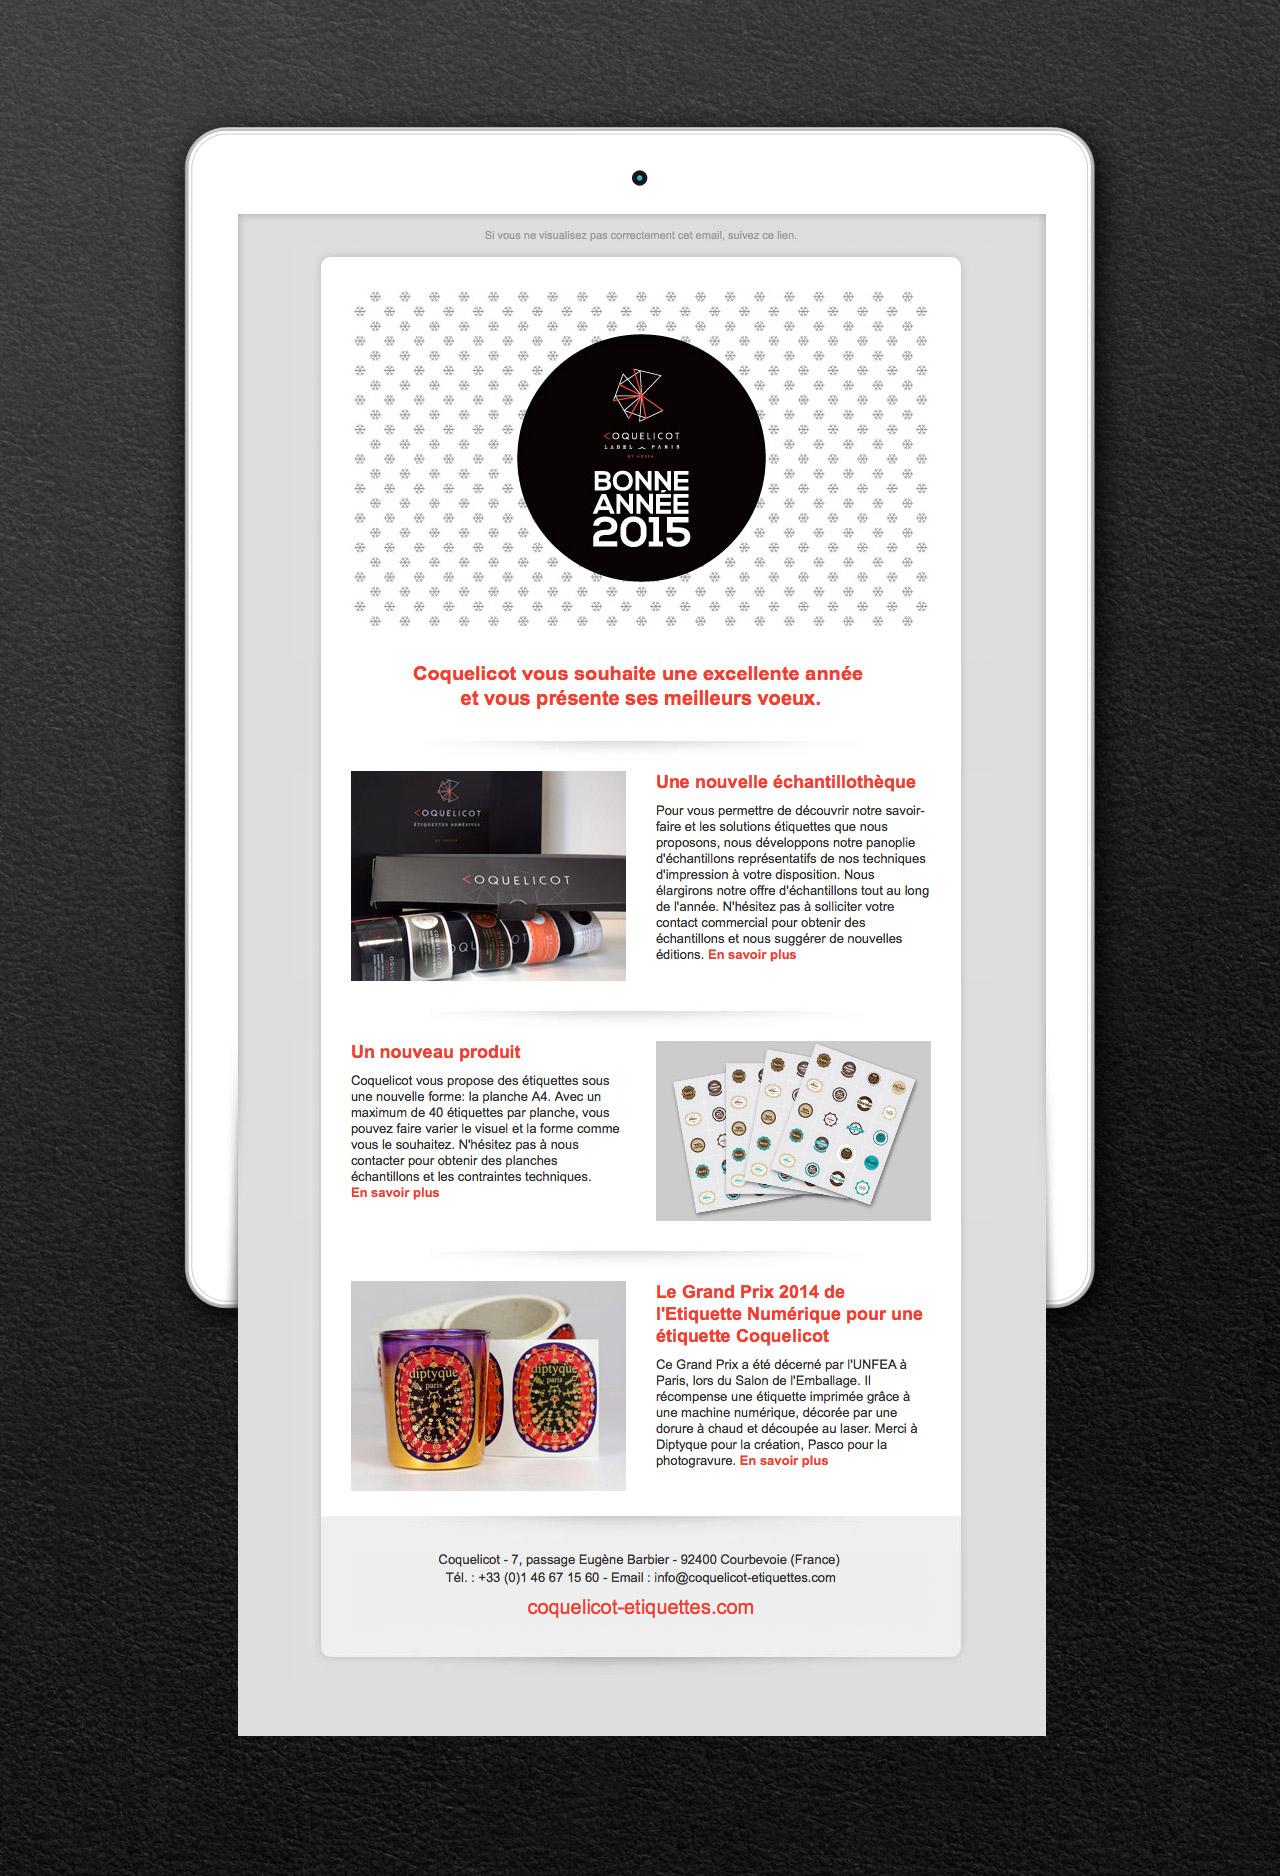 coquelicot-newsletter-mailing-1-design-creation-communication-caconcept-alexis-cretin-graphiste